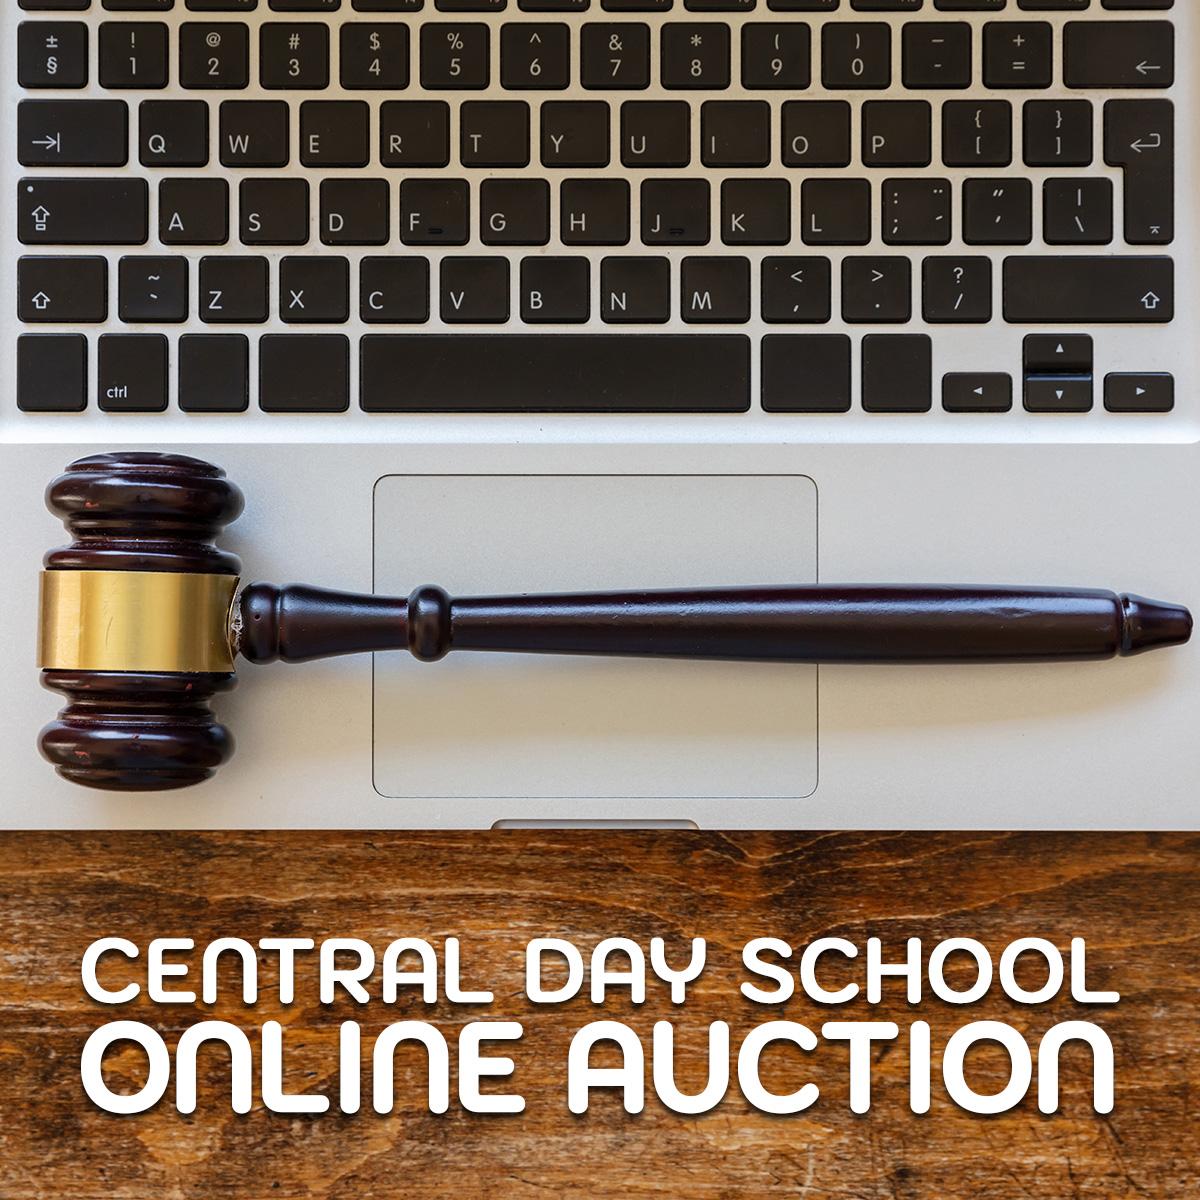 Dayschool Auction Button 1